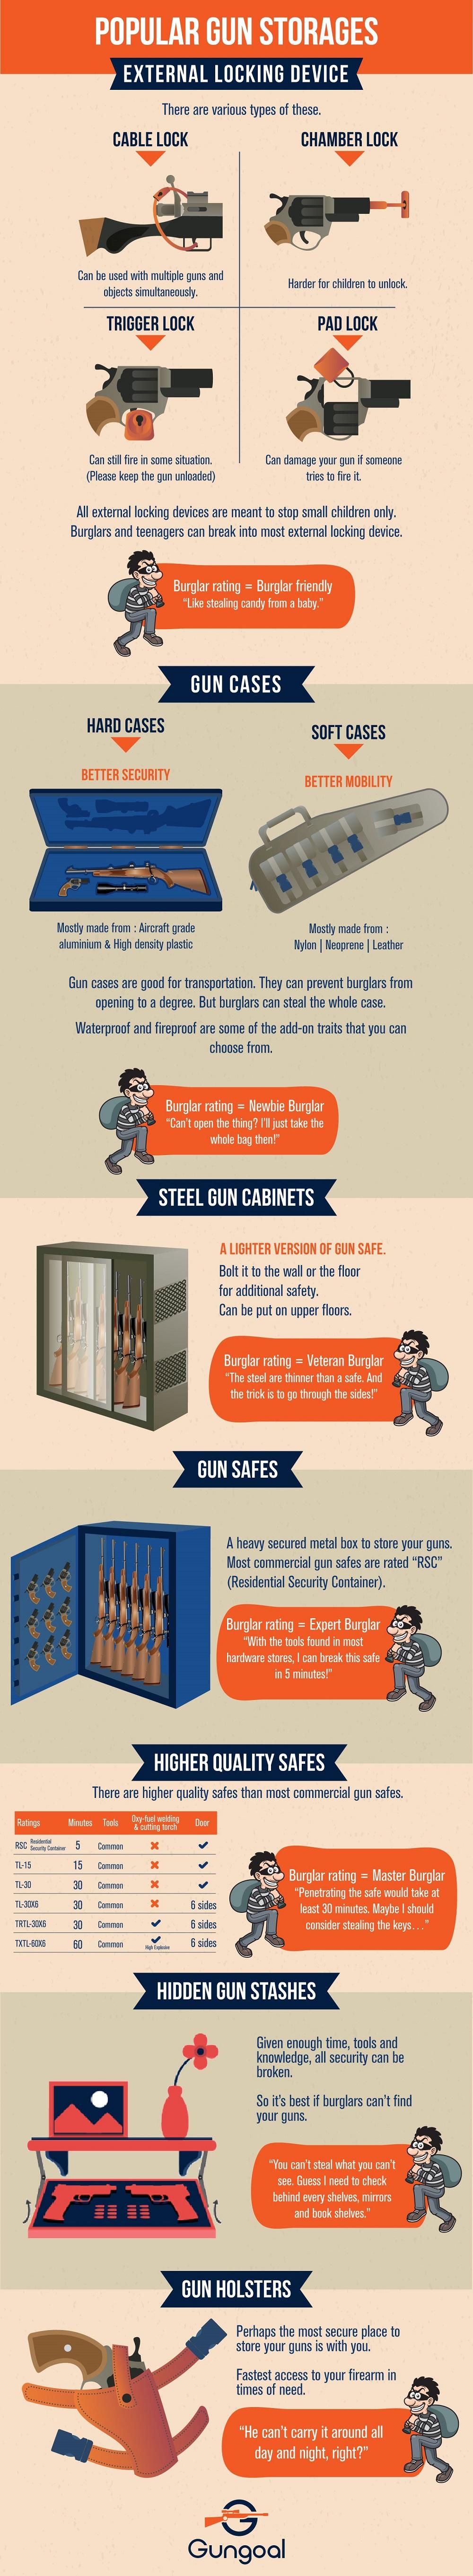 An infographic on popular gun storages